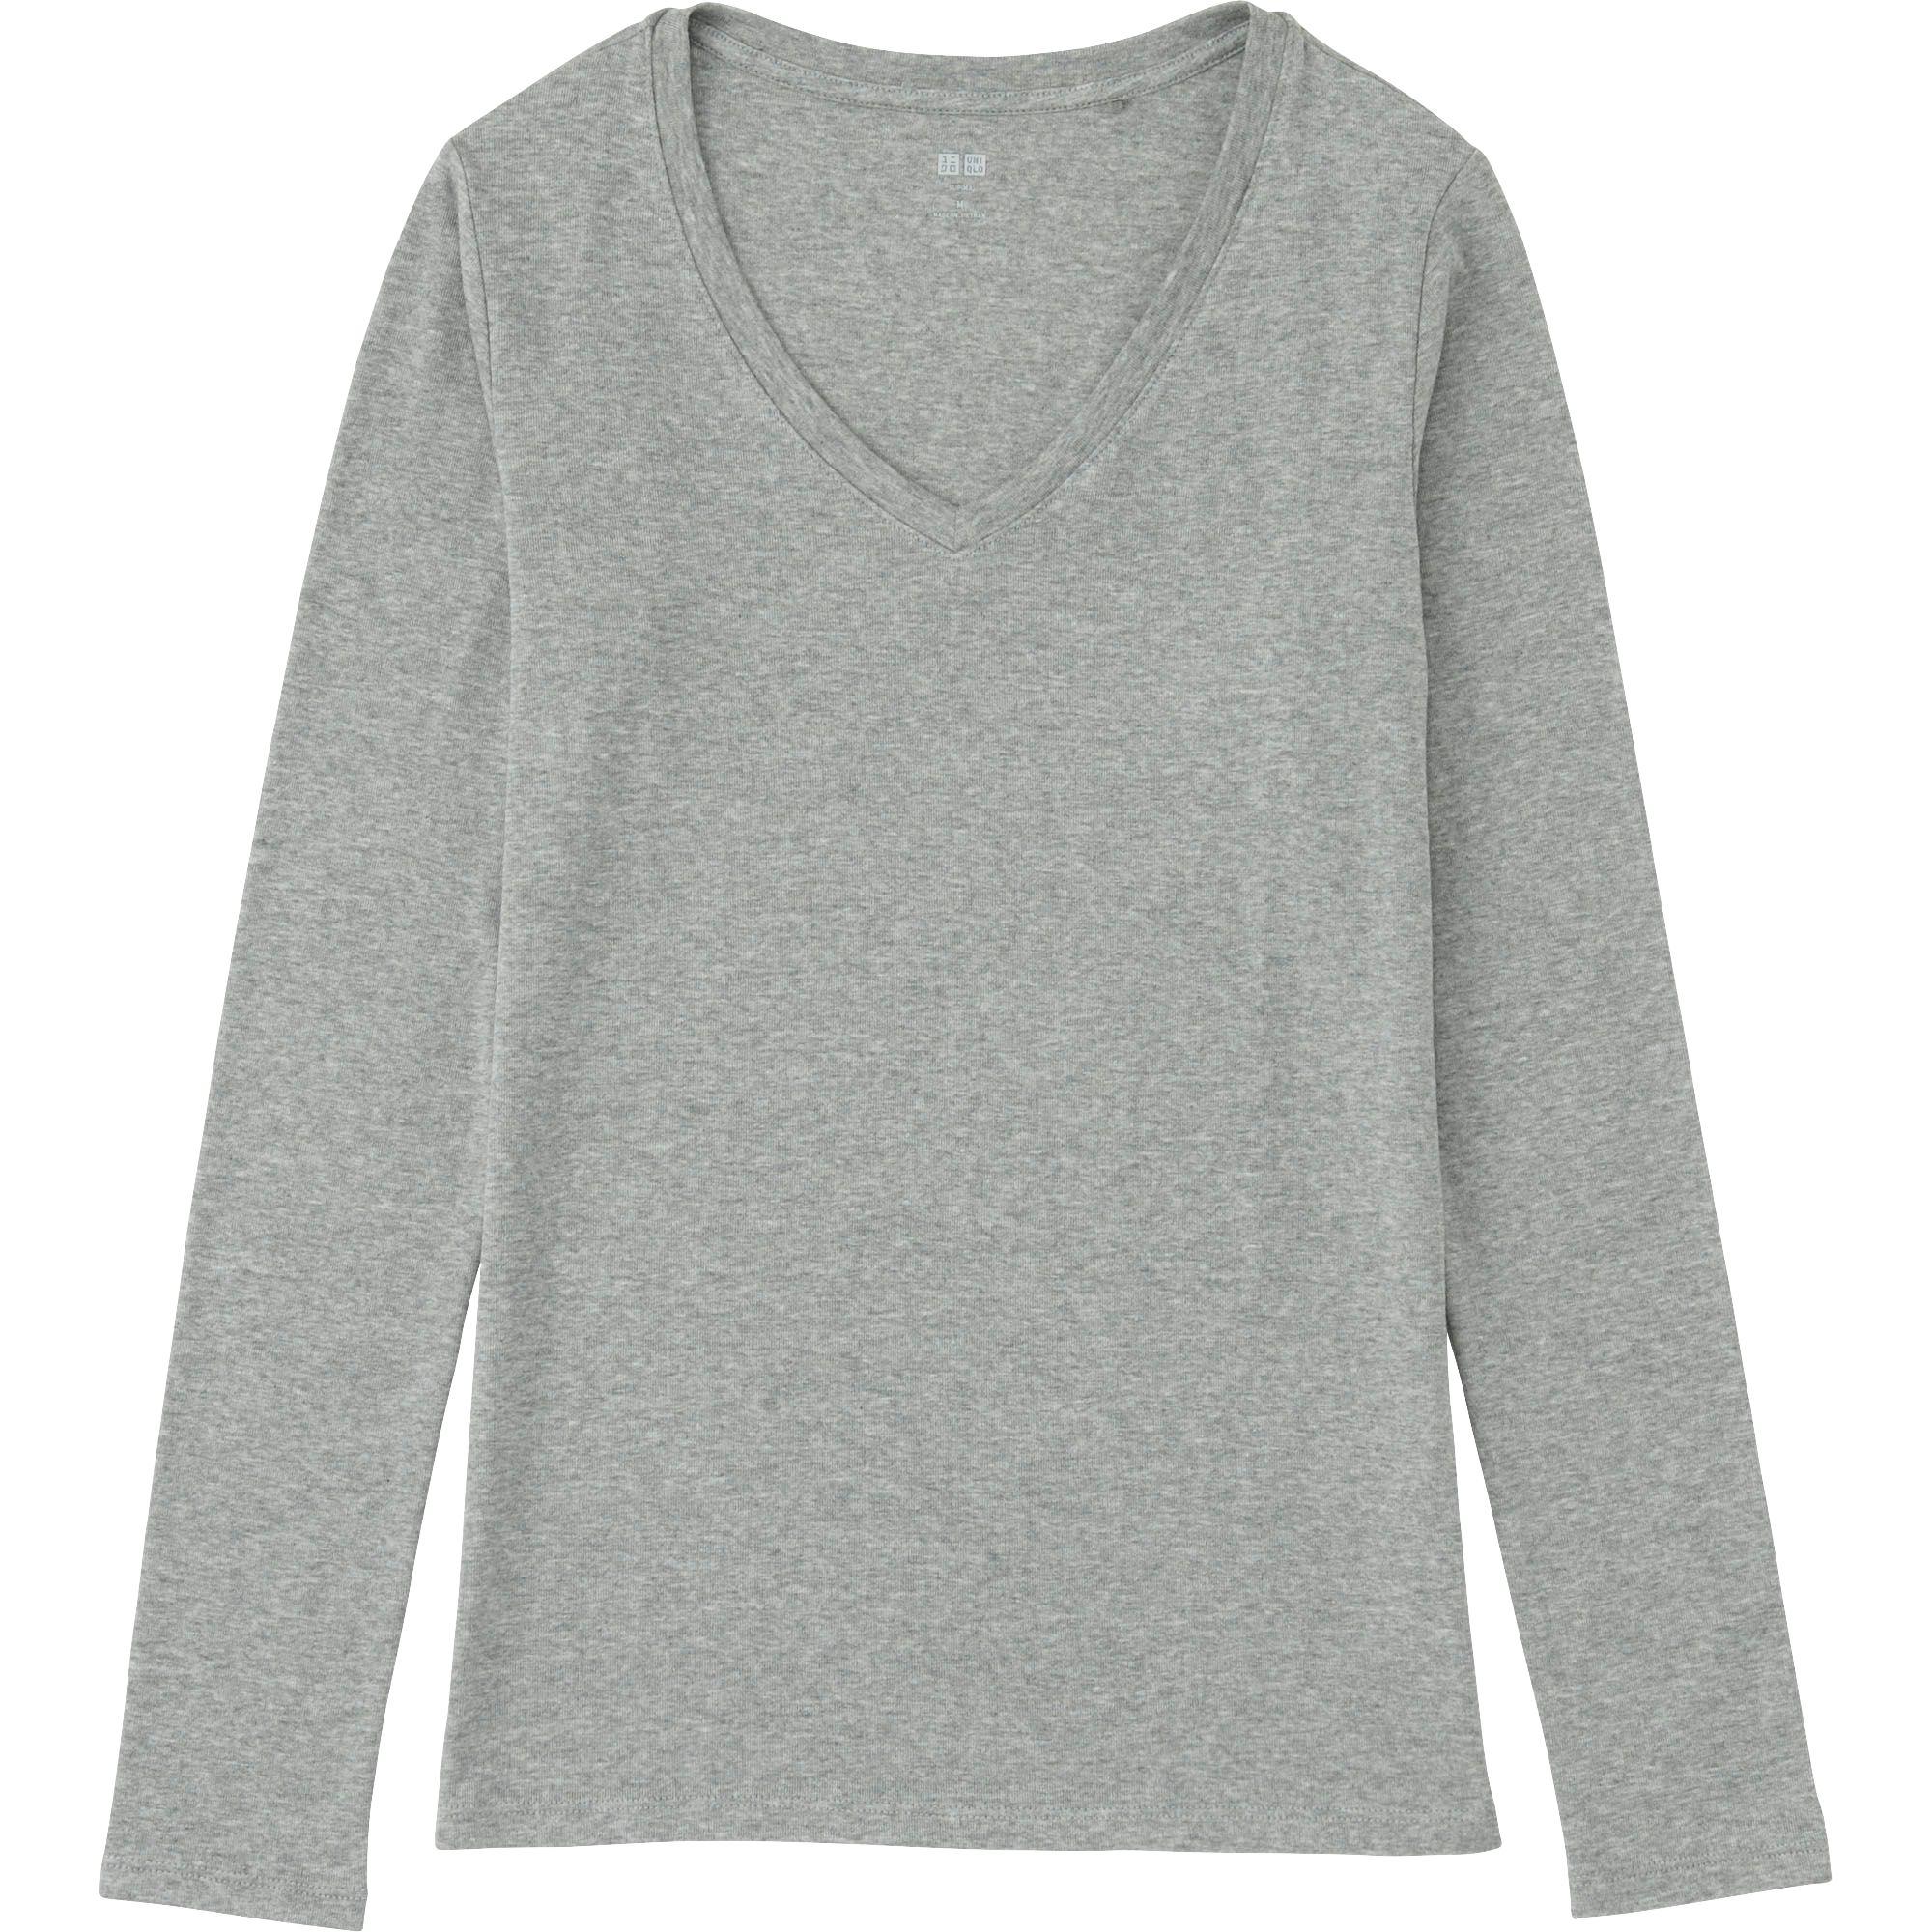 78684f61f8 Lyst - Uniqlo Women Supima Cotton Modal V-neck Long Sleeve T-shirt ...